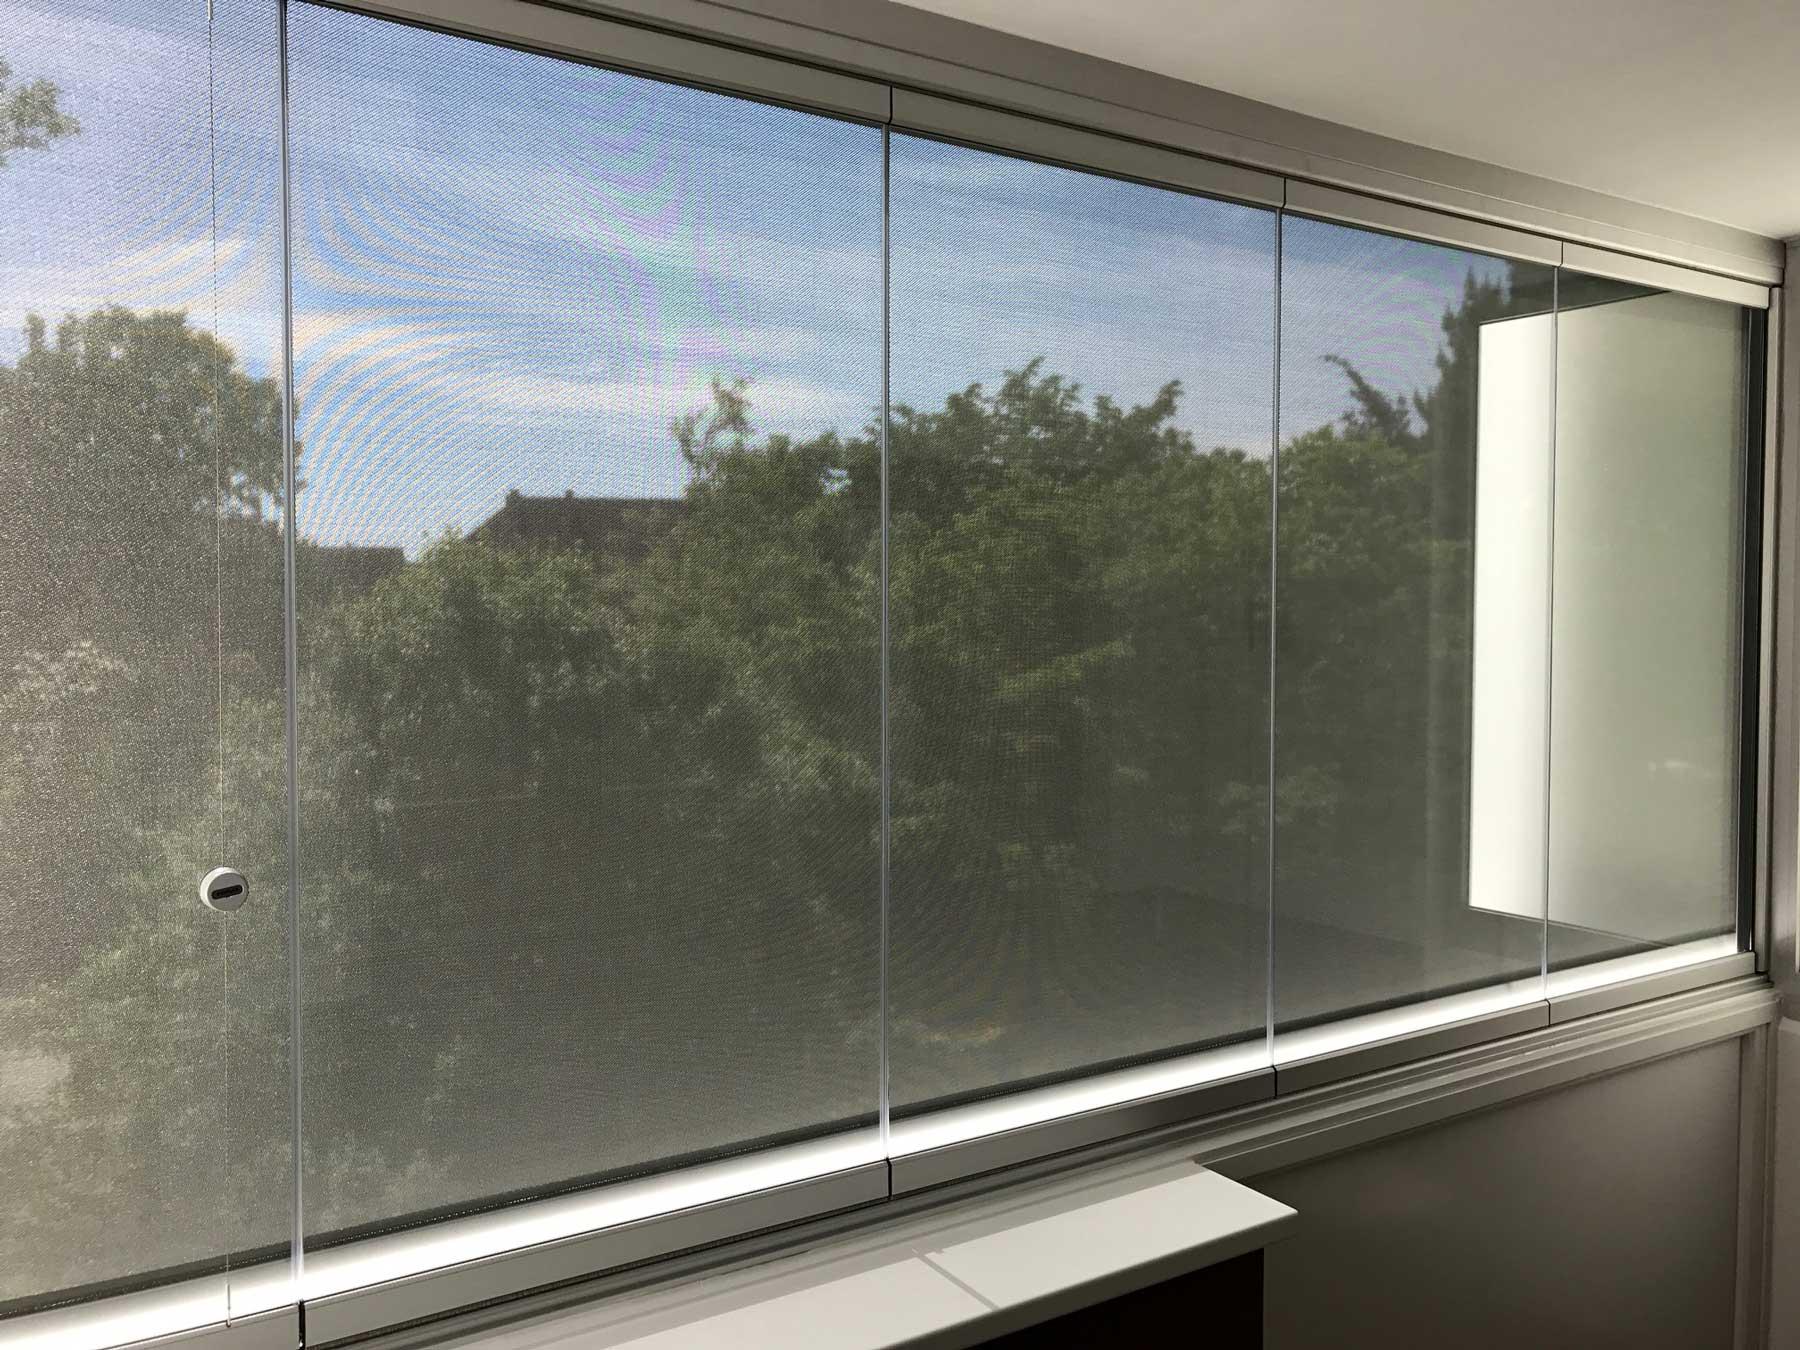 Balkonverglasungen Balkonverkleidungen & Terrassenanbauten